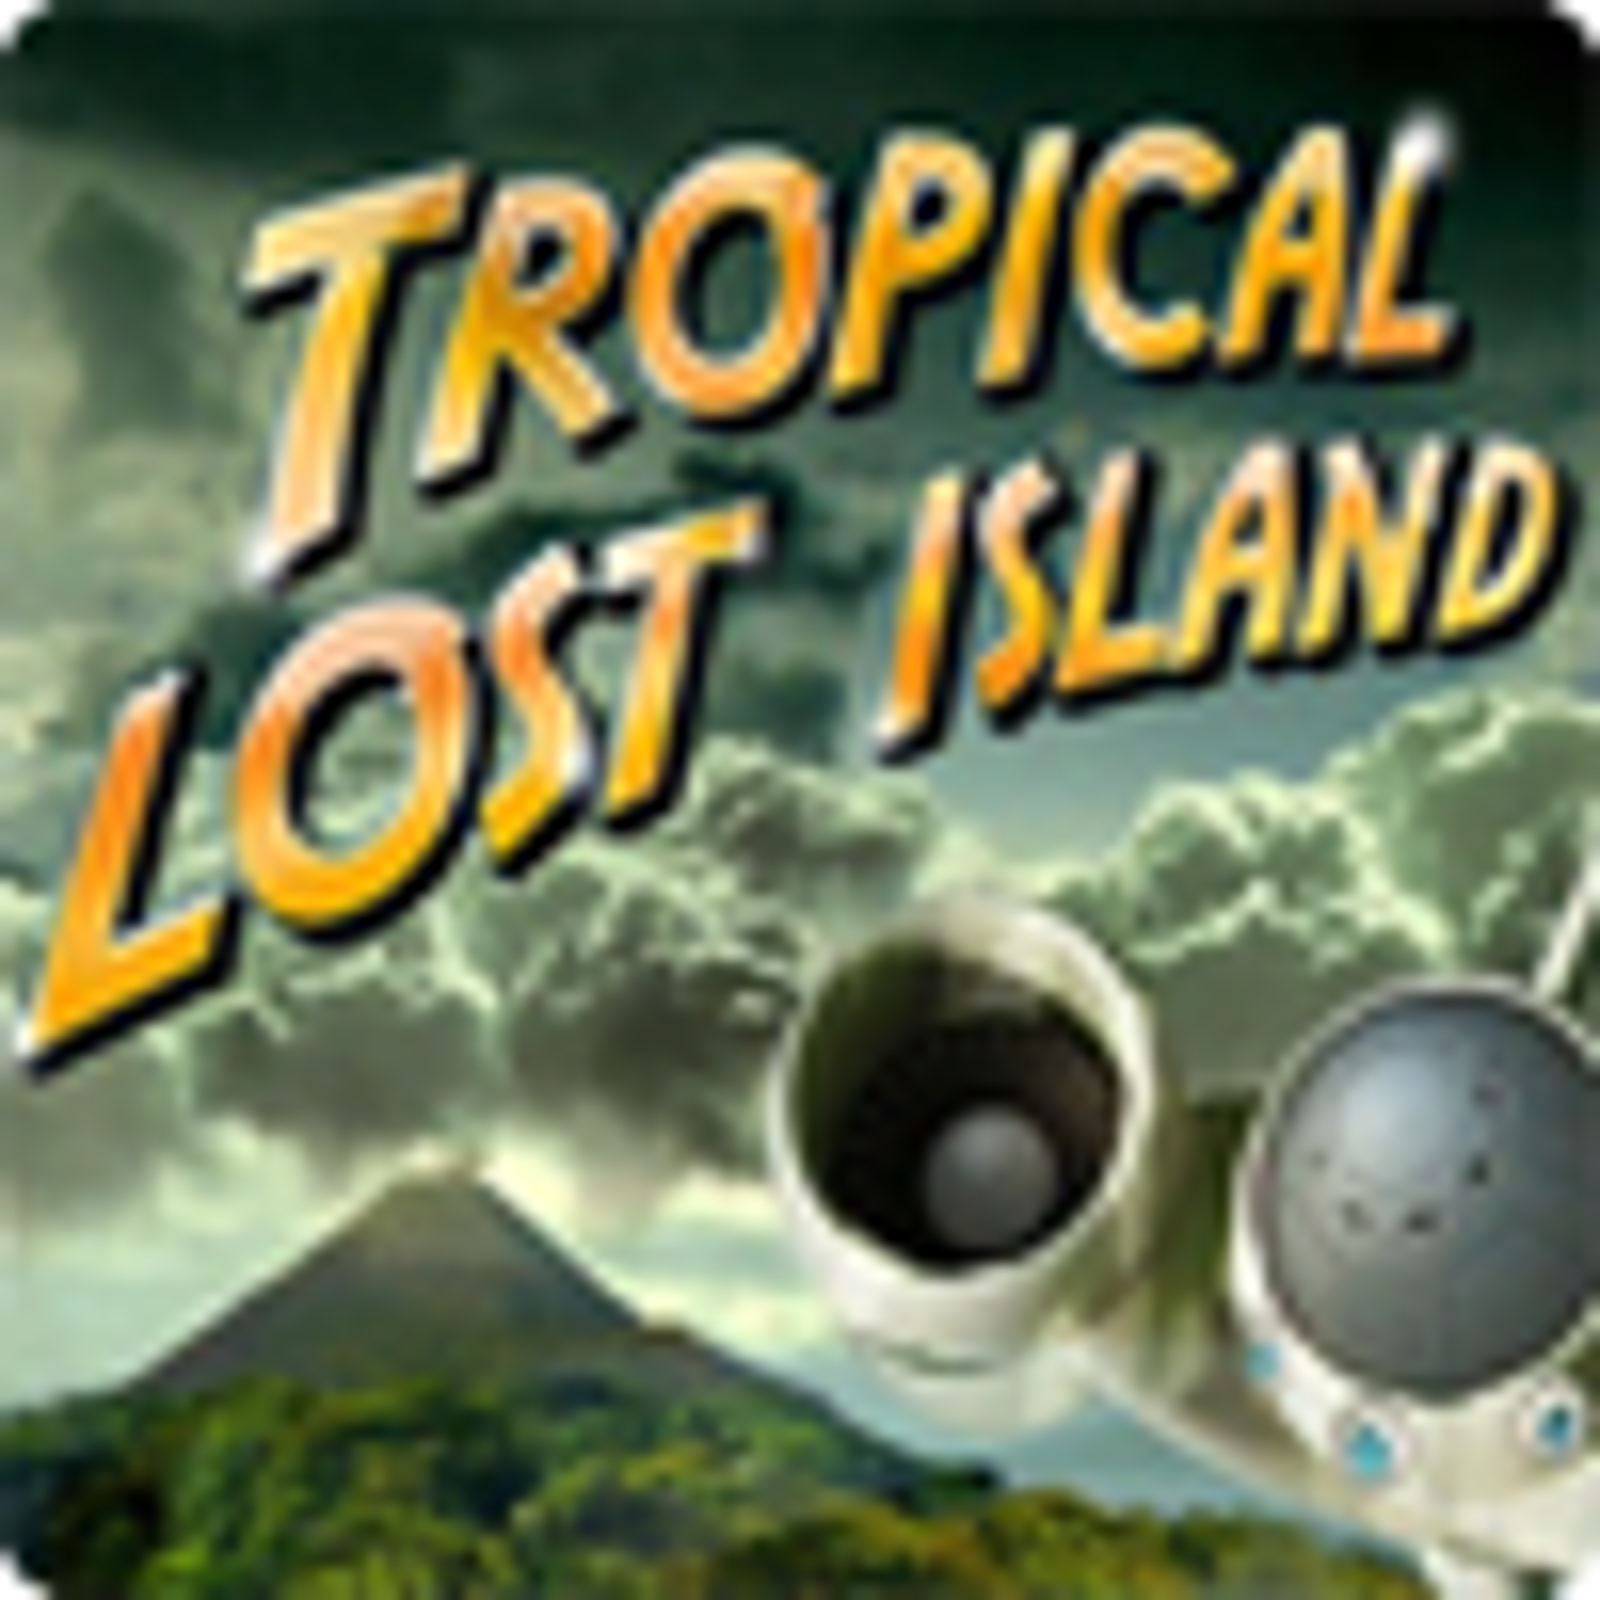 Tropical Lost Island